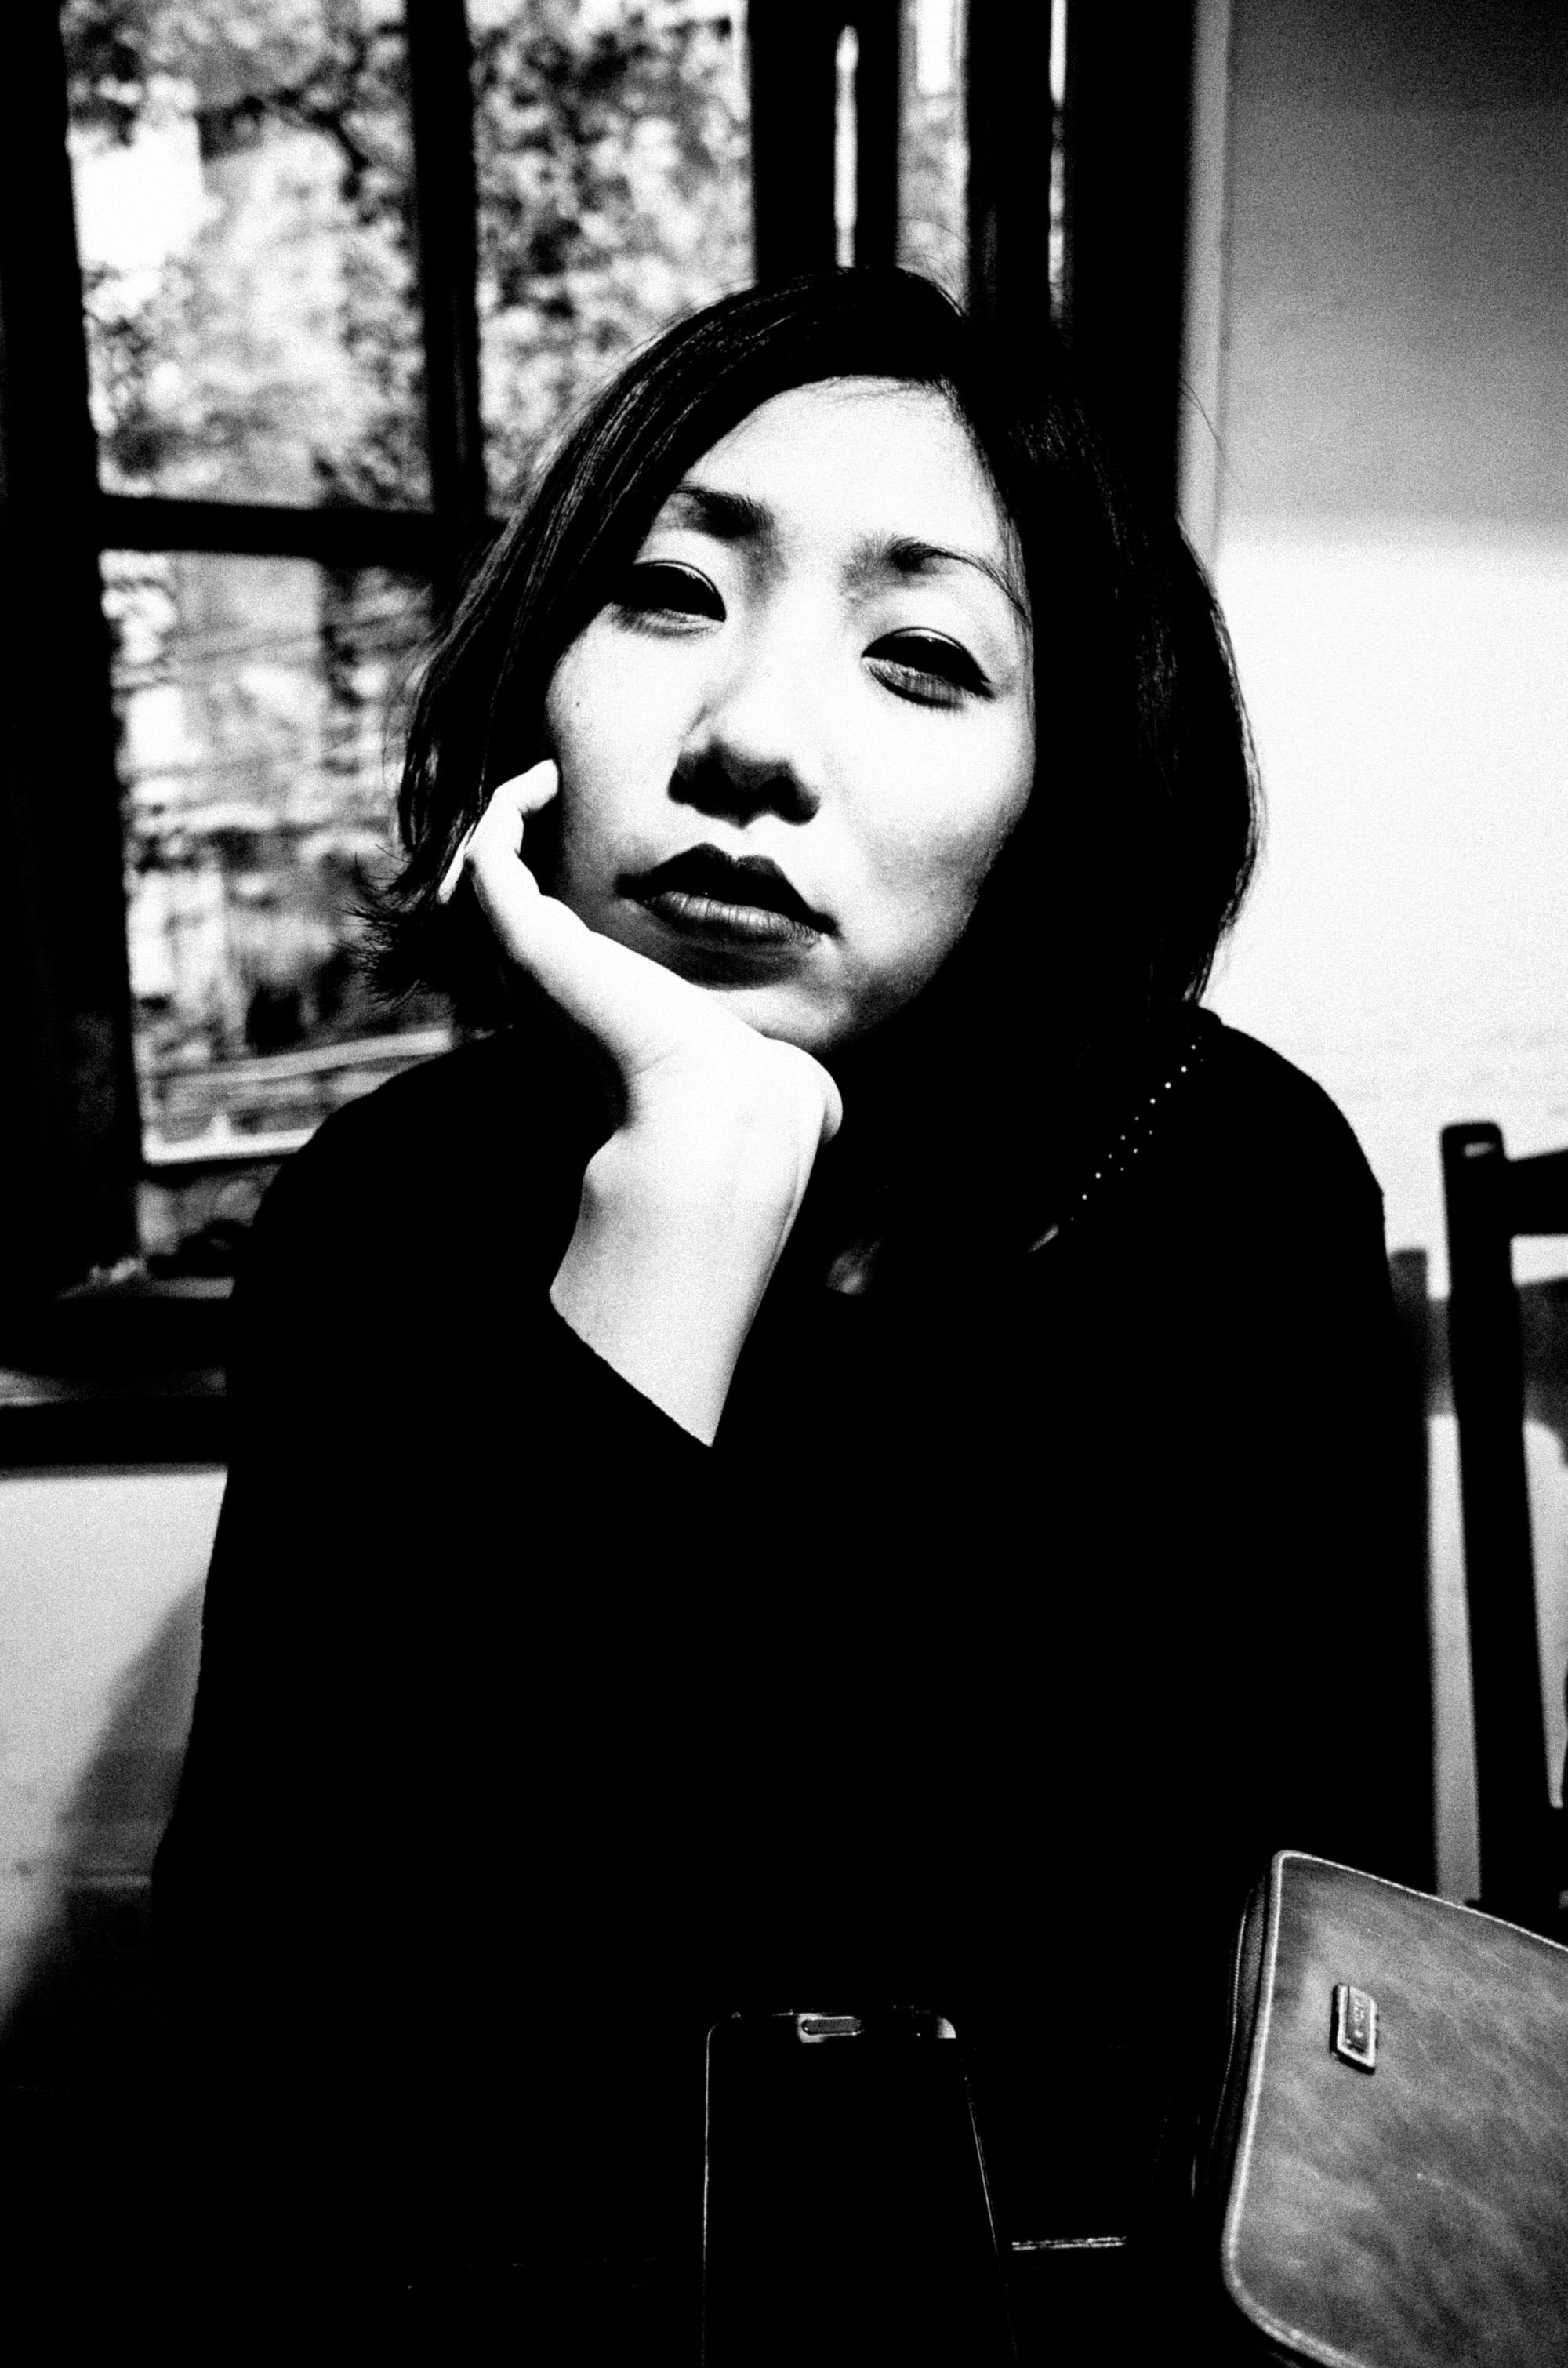 eric kim street photography hanoi-0005124